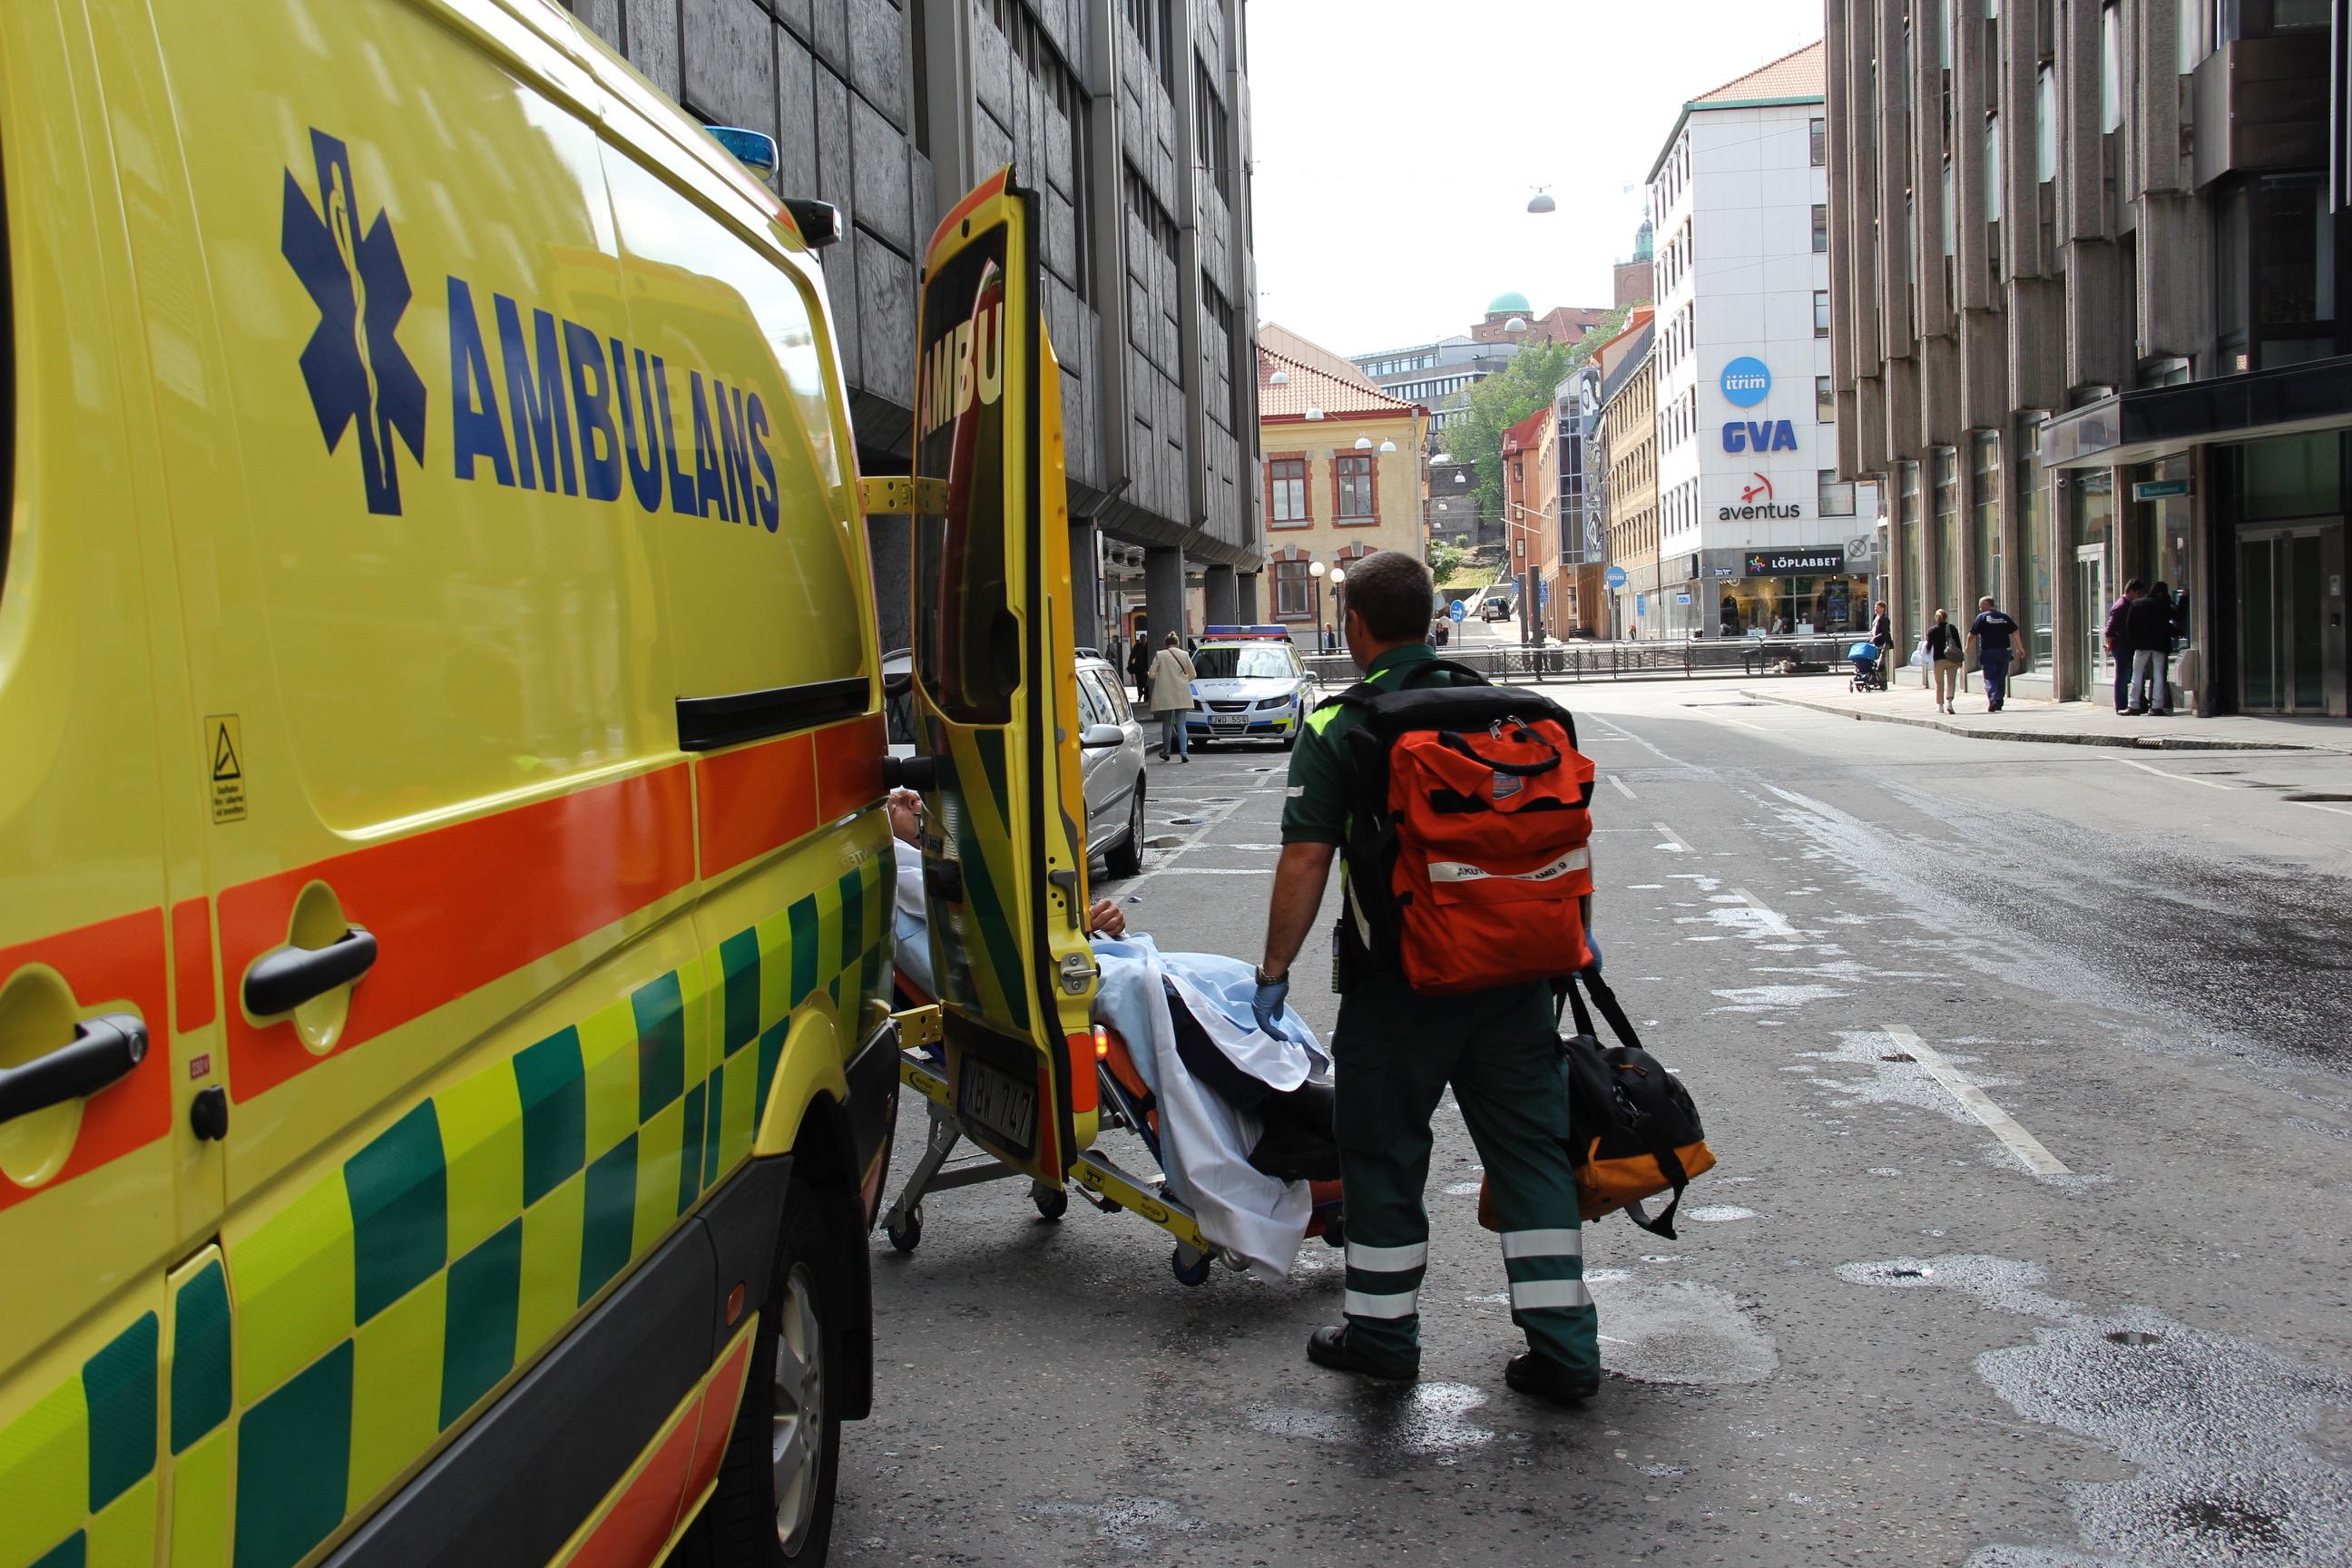 Svensk ambulanse i aksjon. Foto: Live Oftedahl